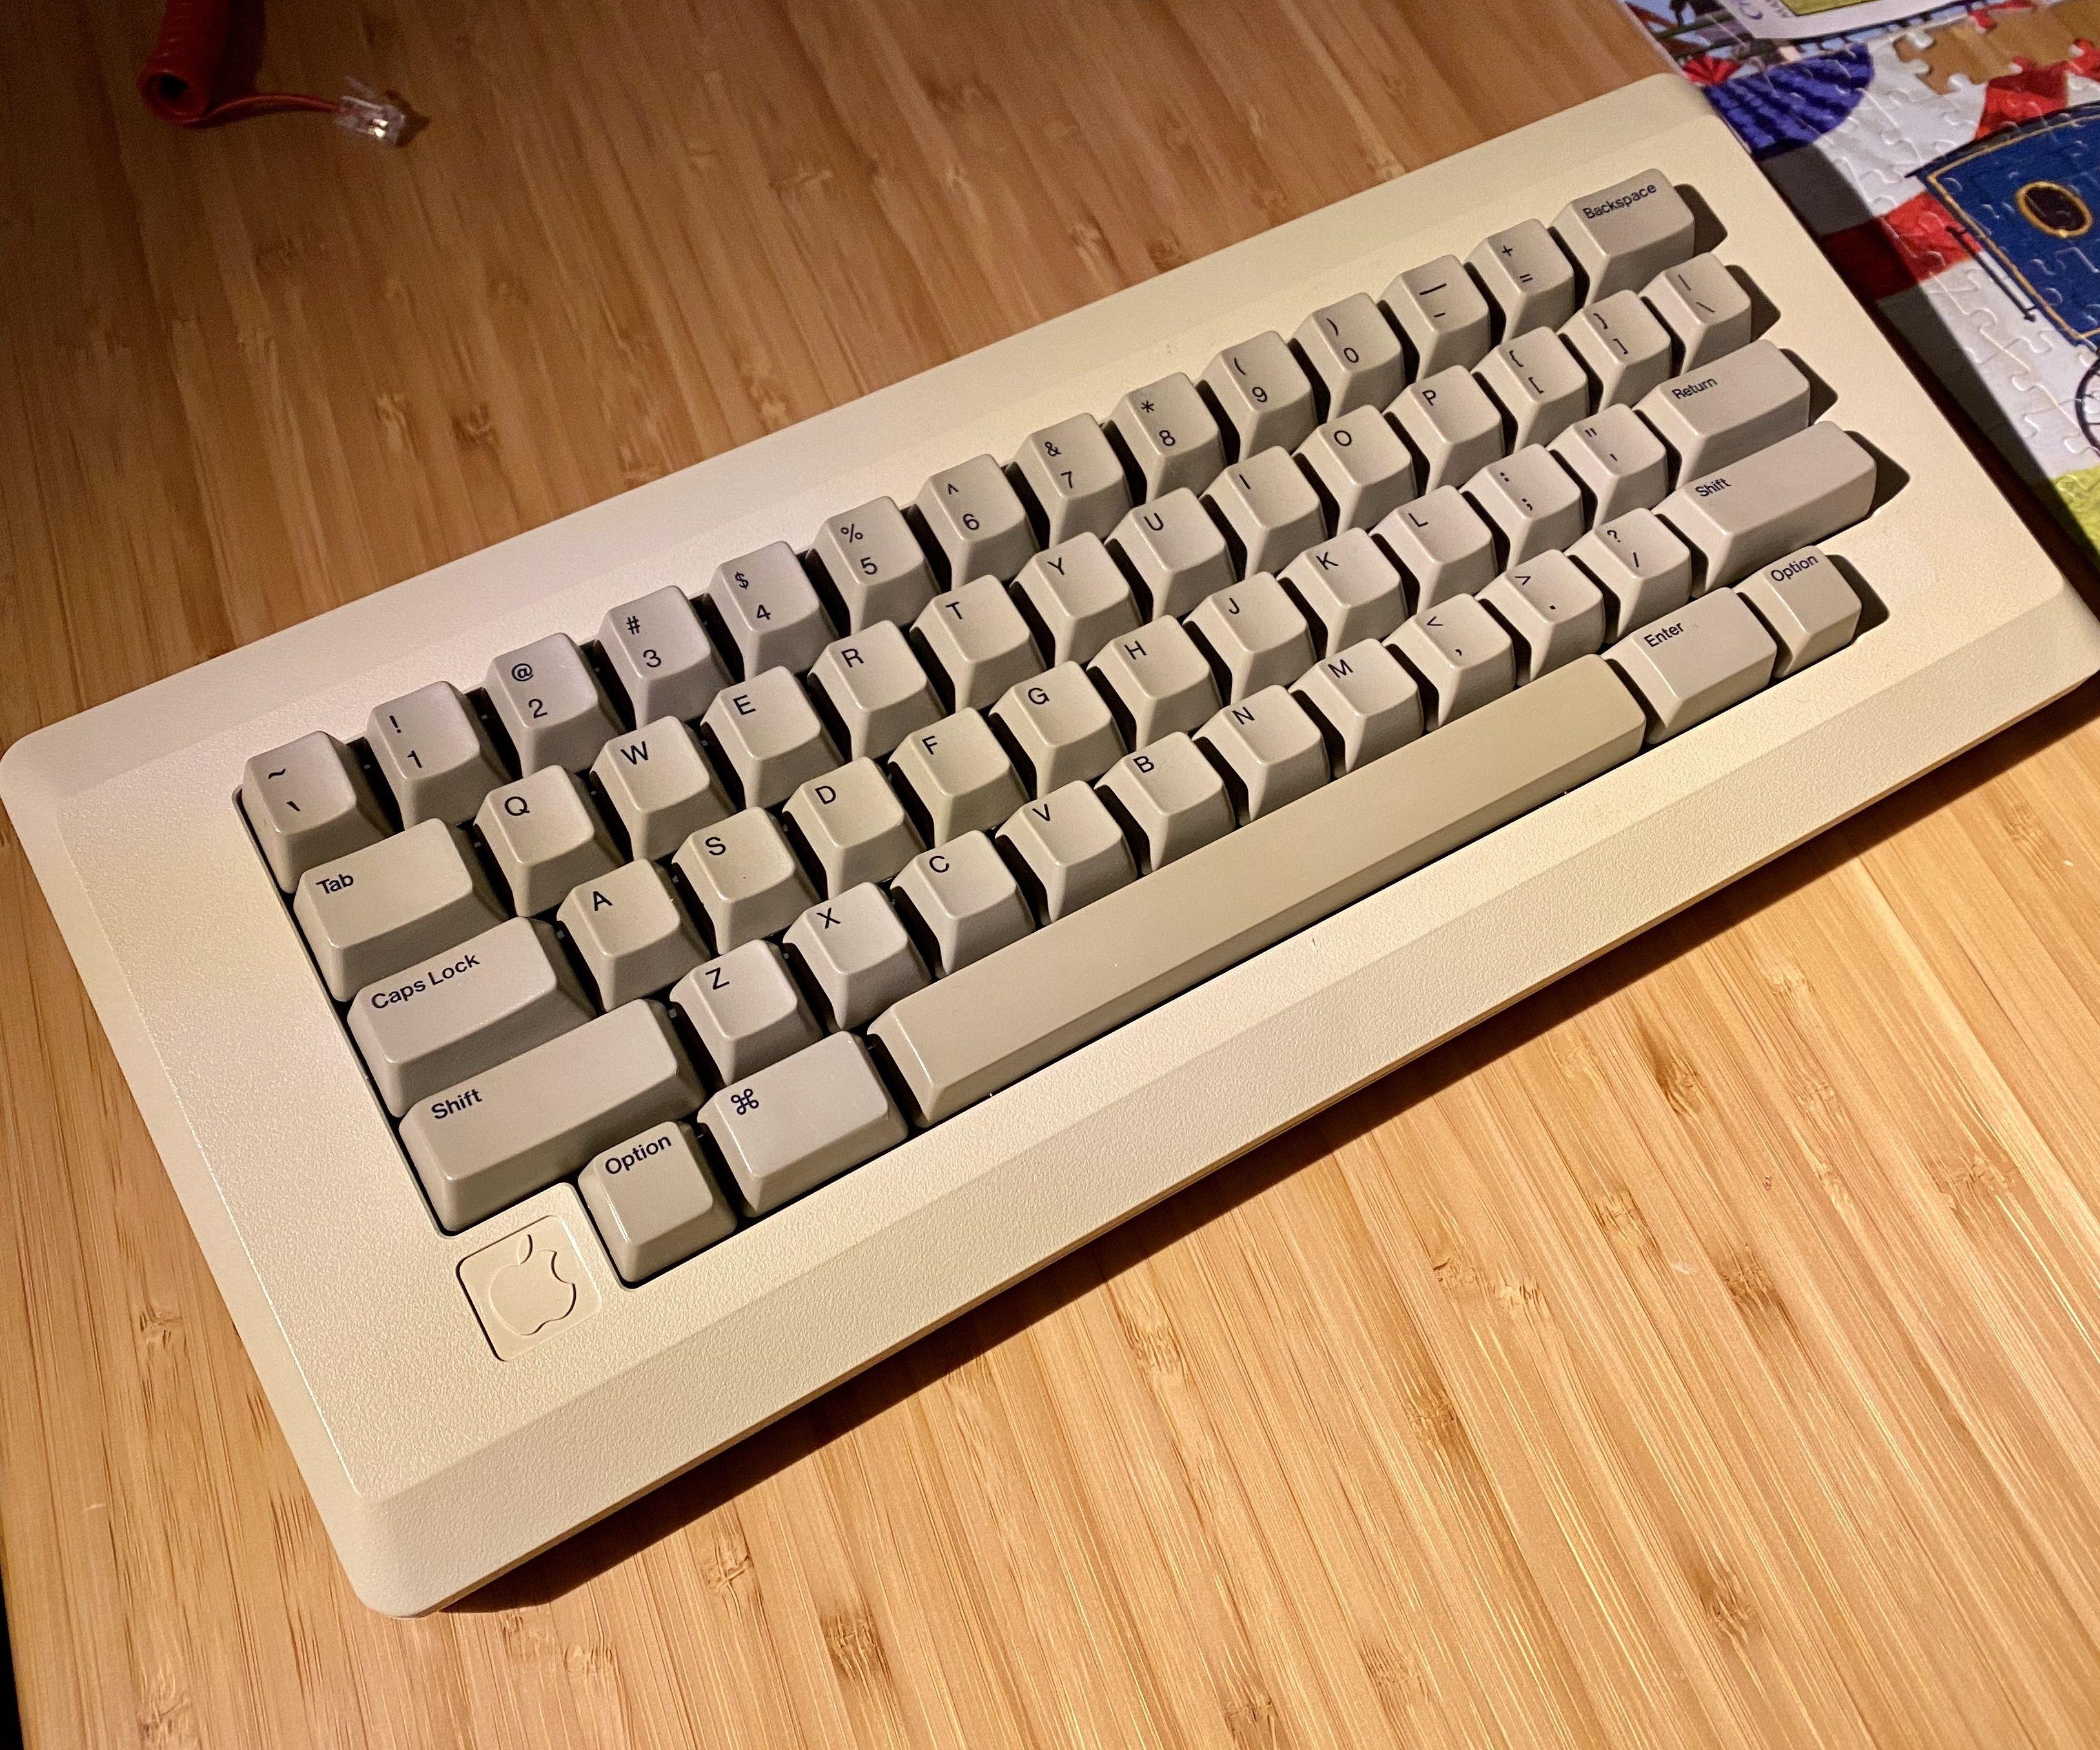 Apple M0110 Keyboard Crossover Adapter